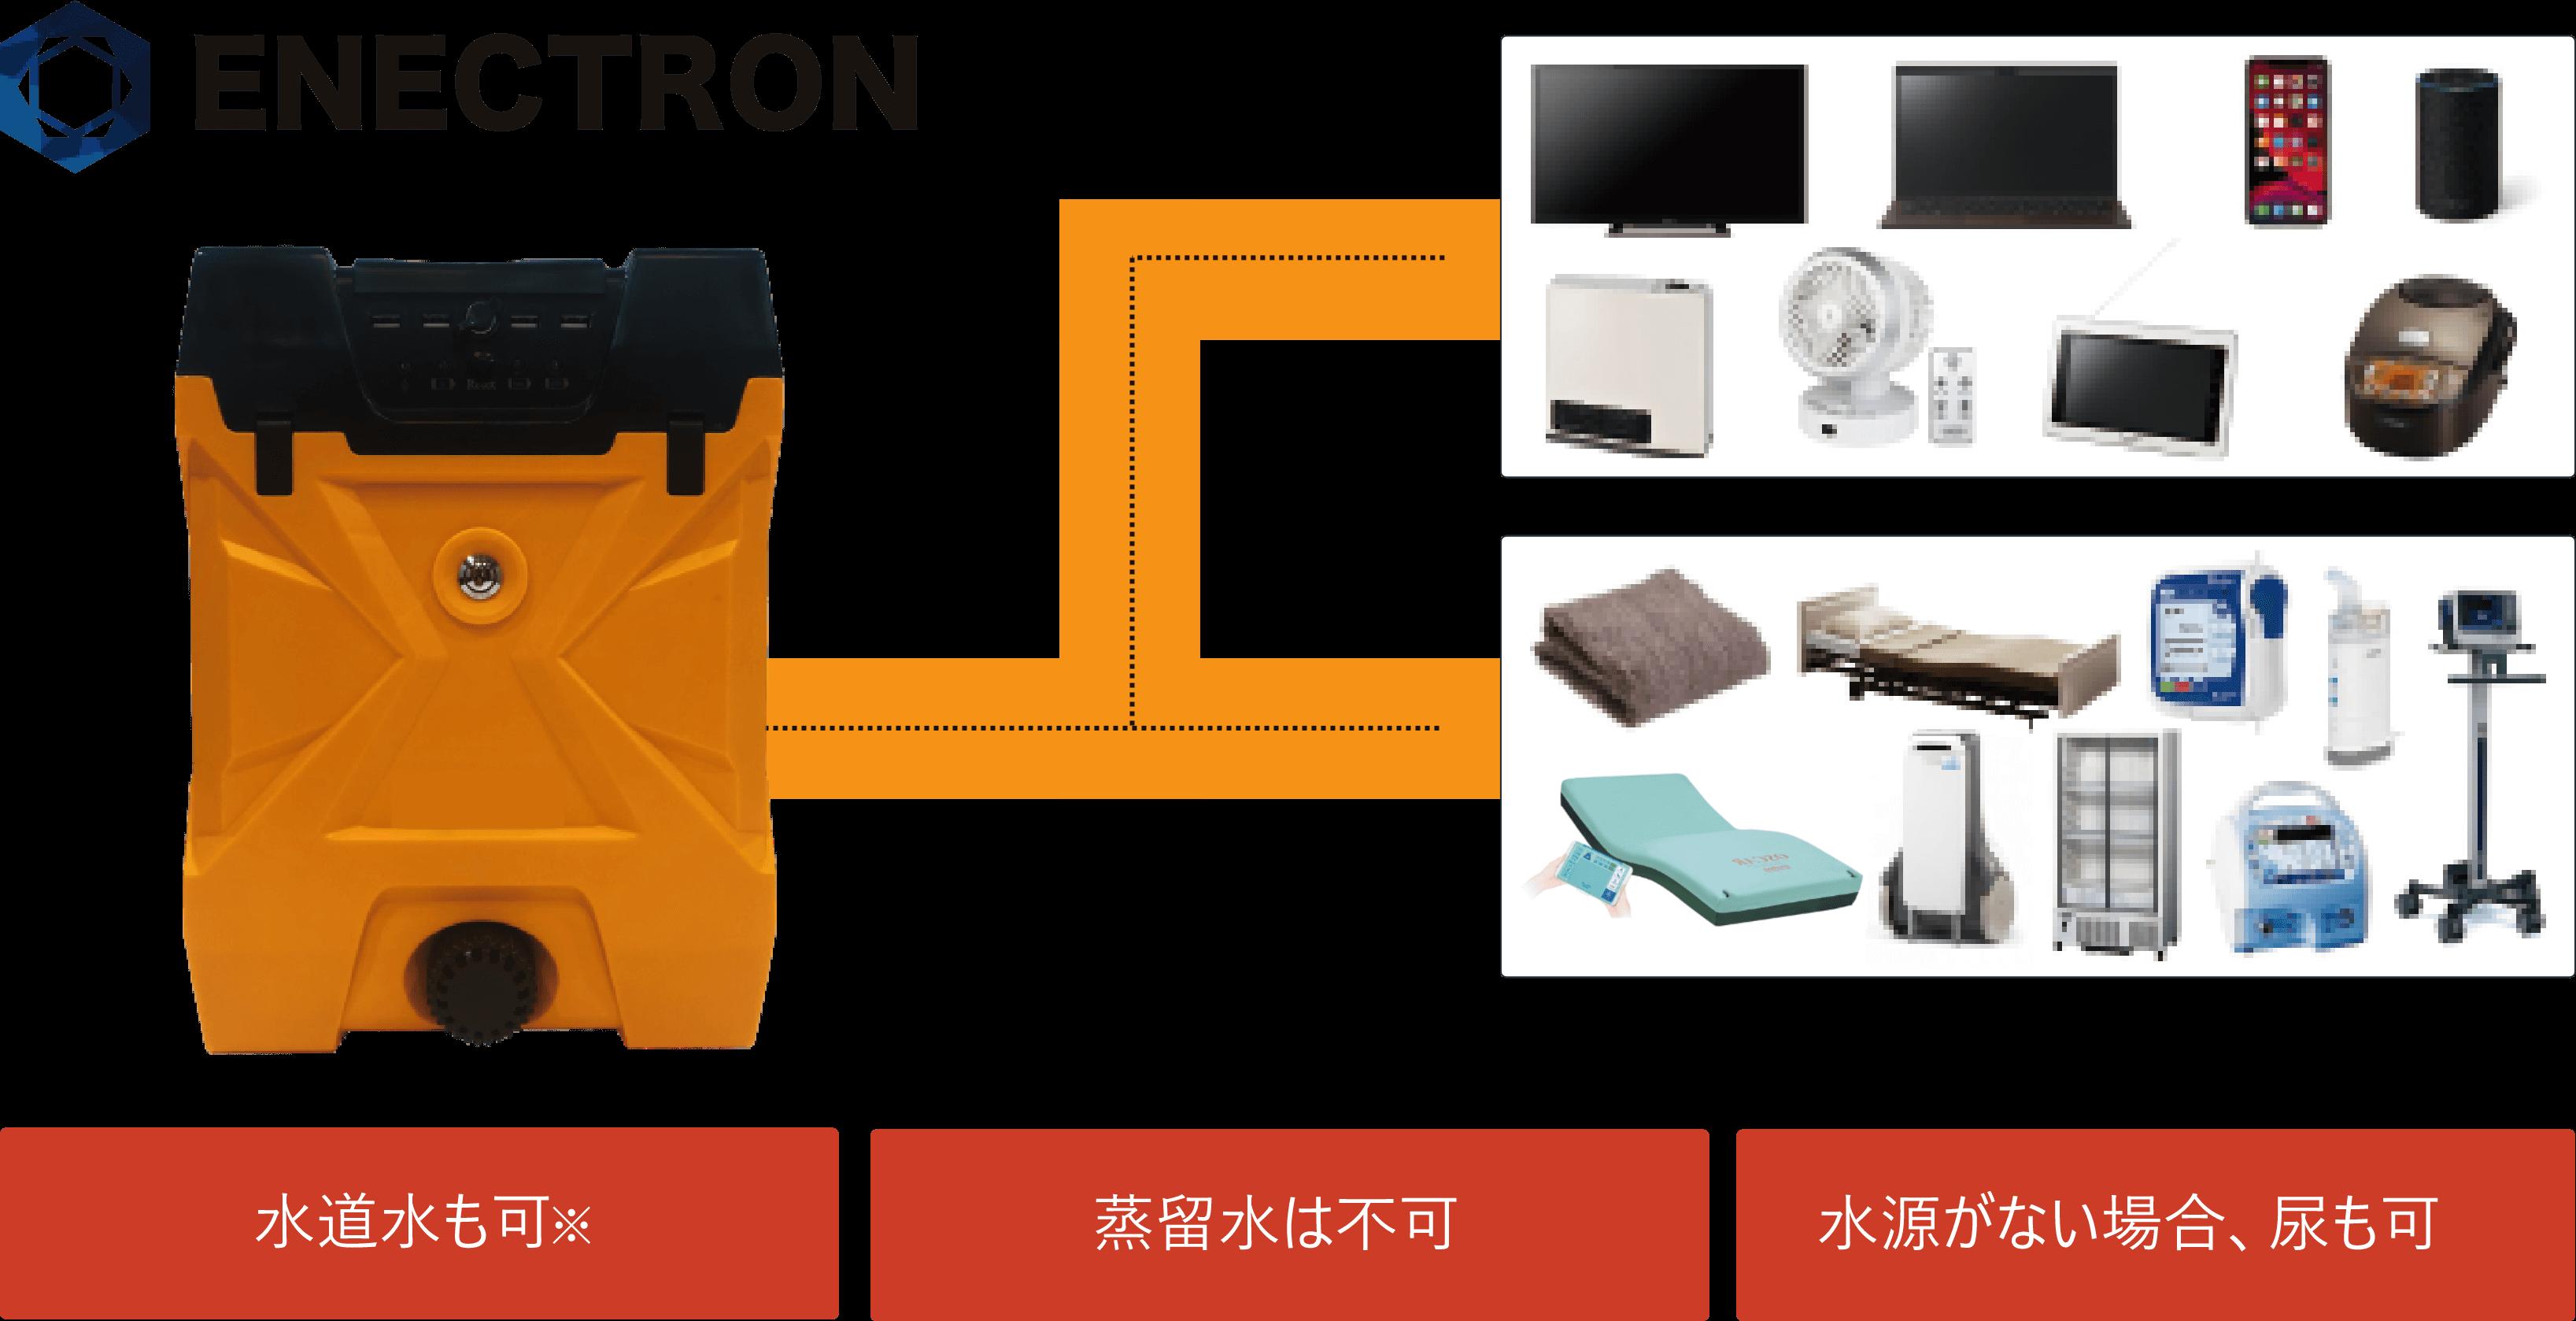 ENECTRONと接続するデバイス